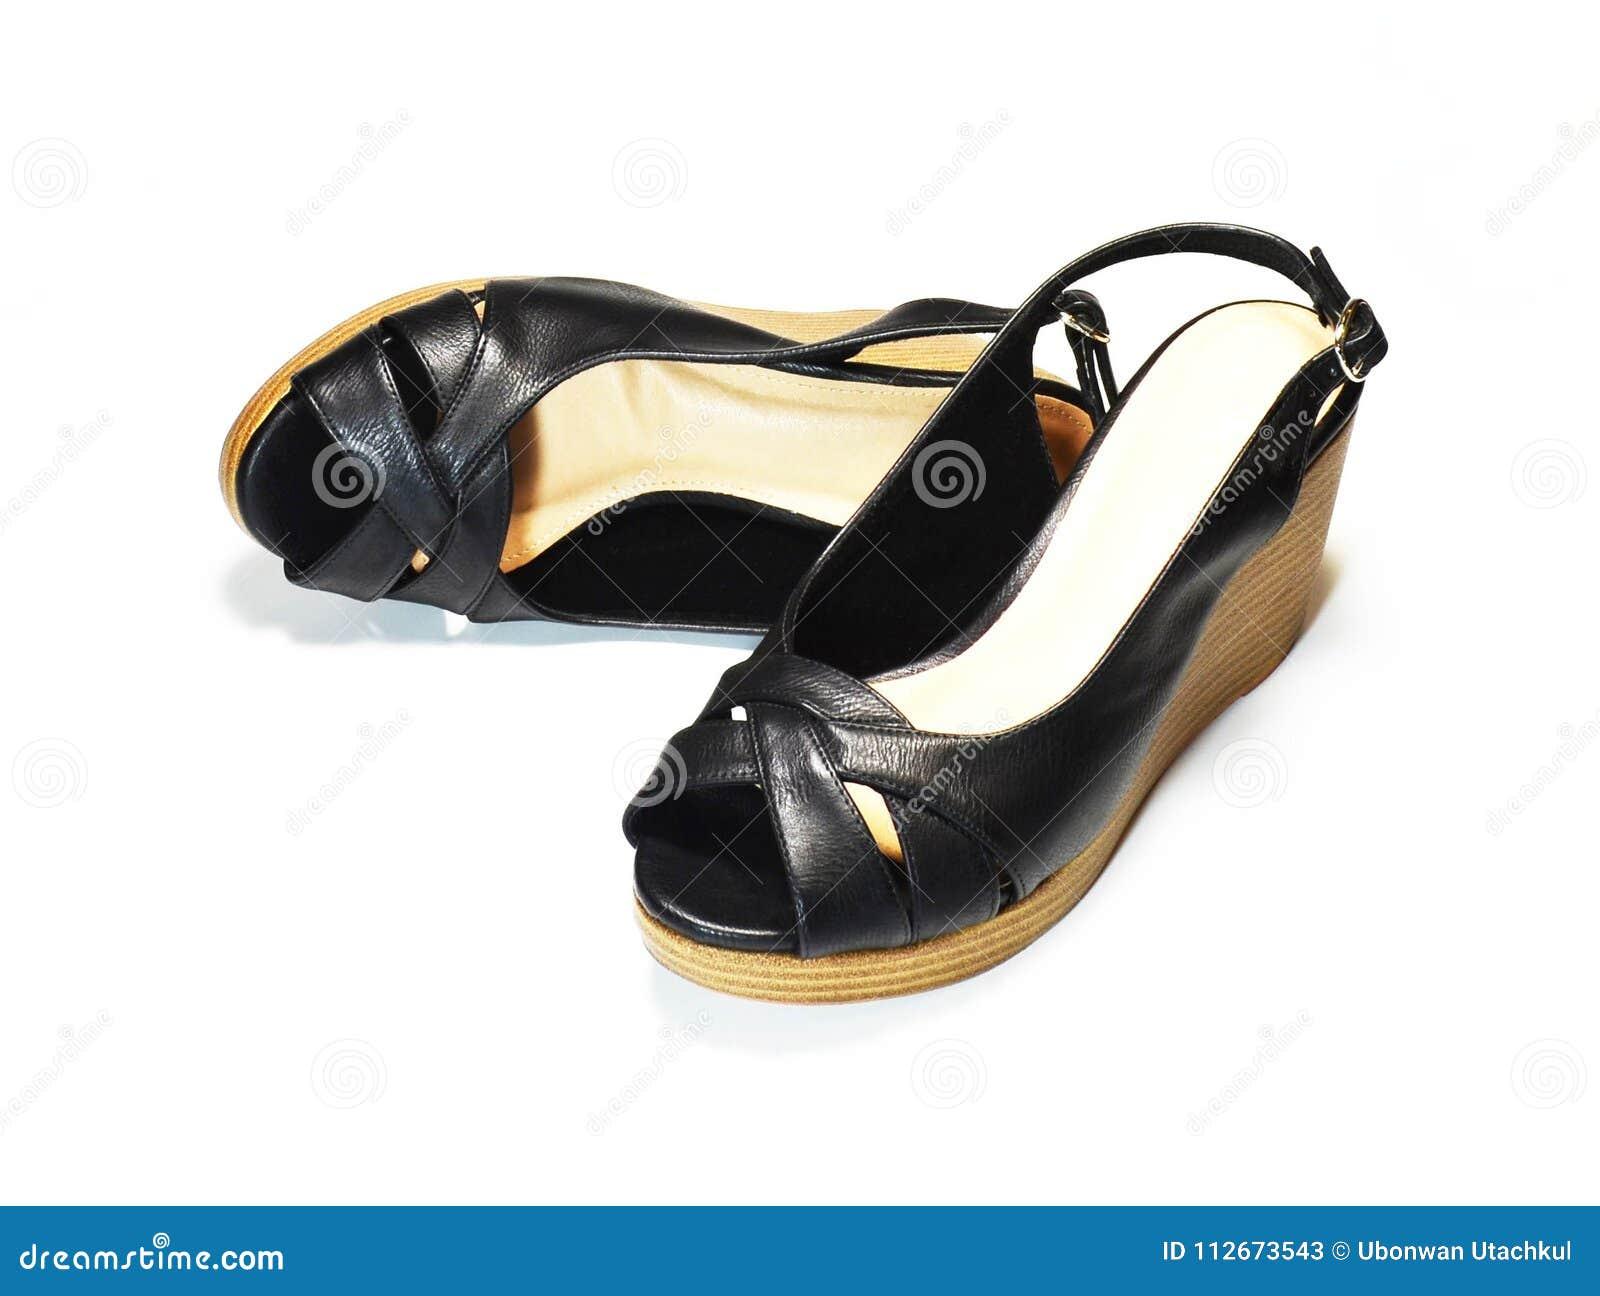 d6dd4e61214 Pair of elegant woman black high-heel shoes